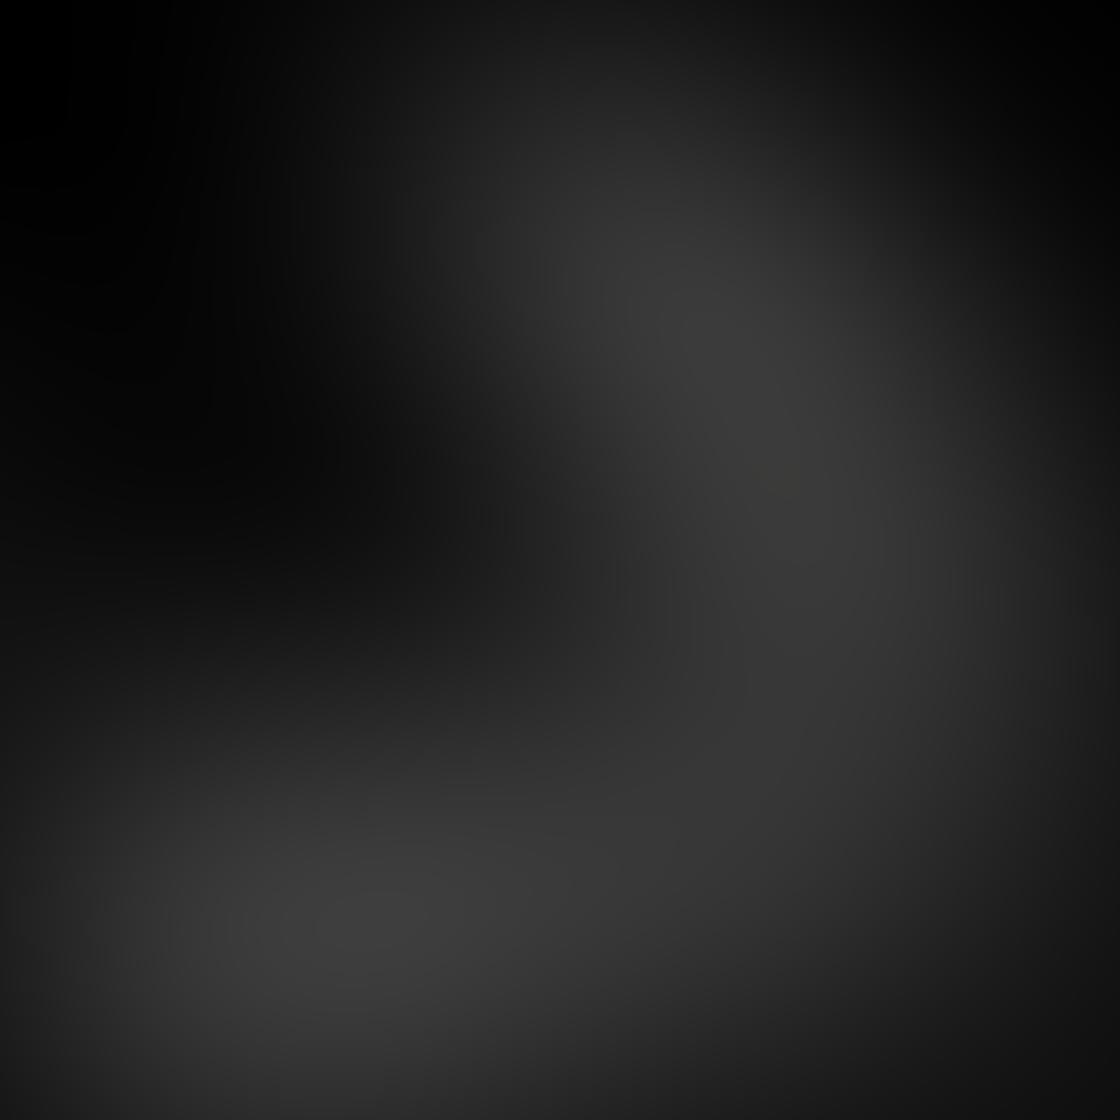 iPhone Photo Shadows 22